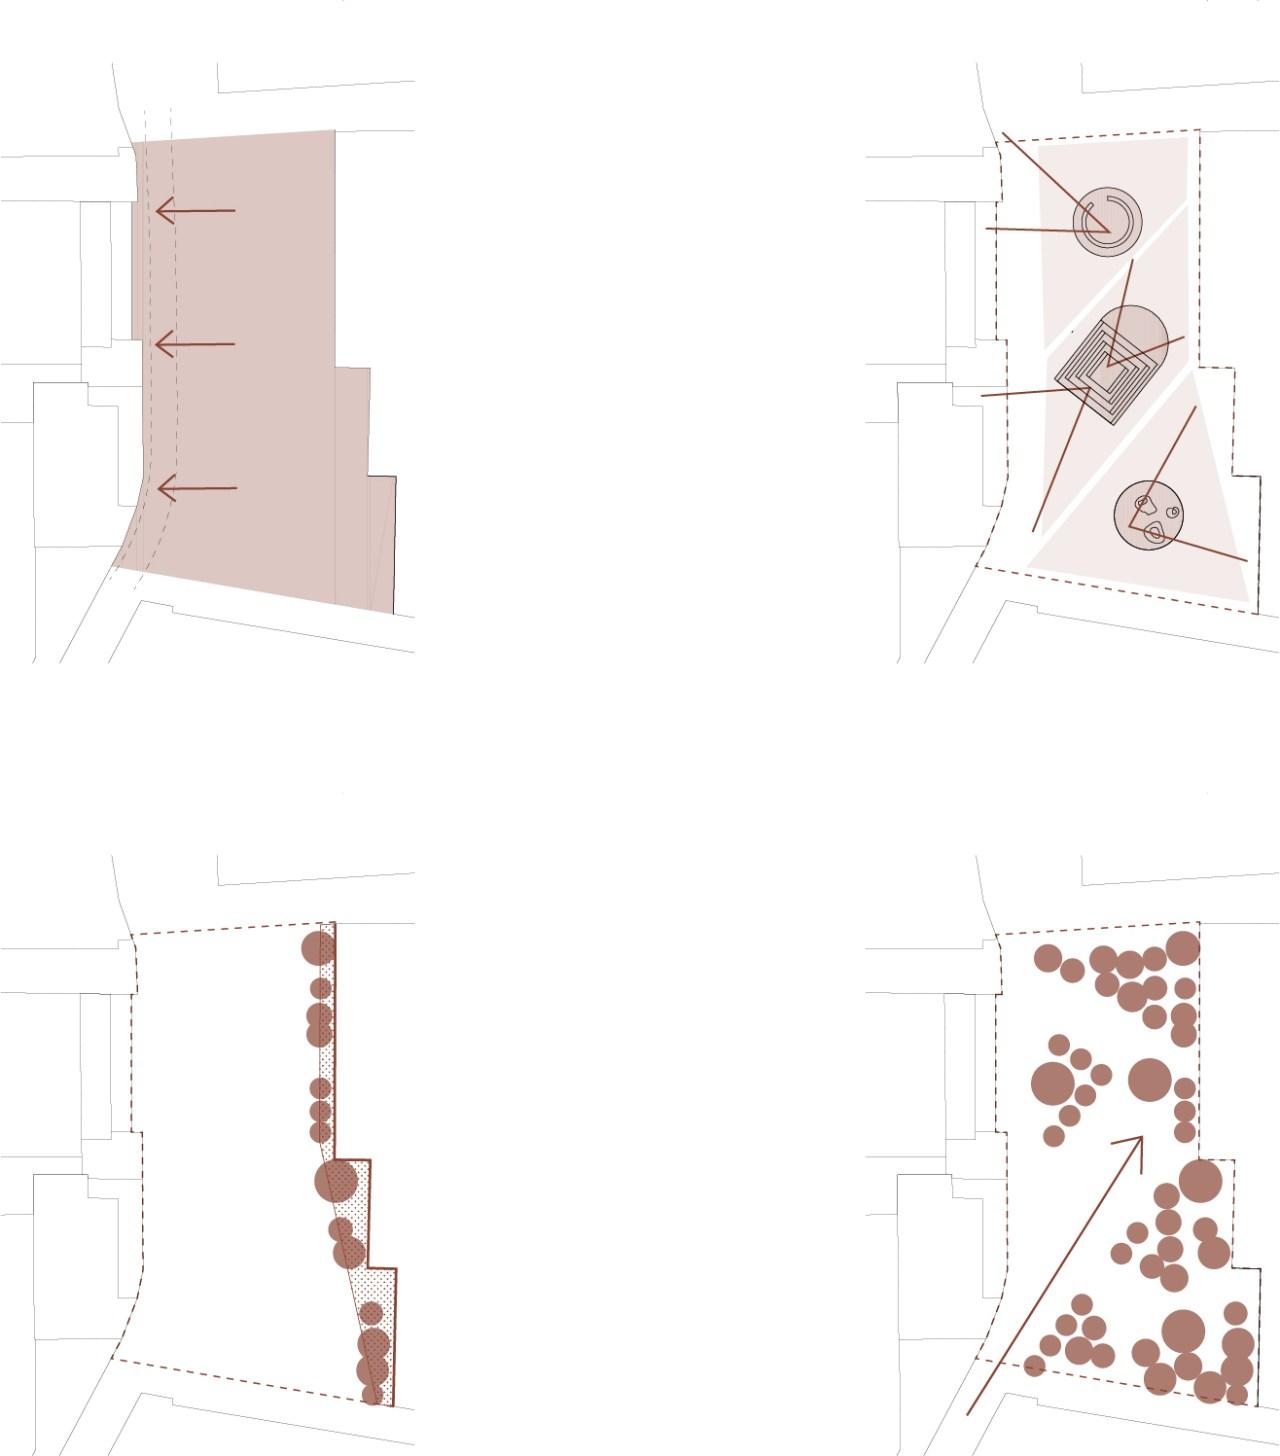 BDRbureau_Trittico-una-piazza-tre-spazi-public-space-refurbishment_schema